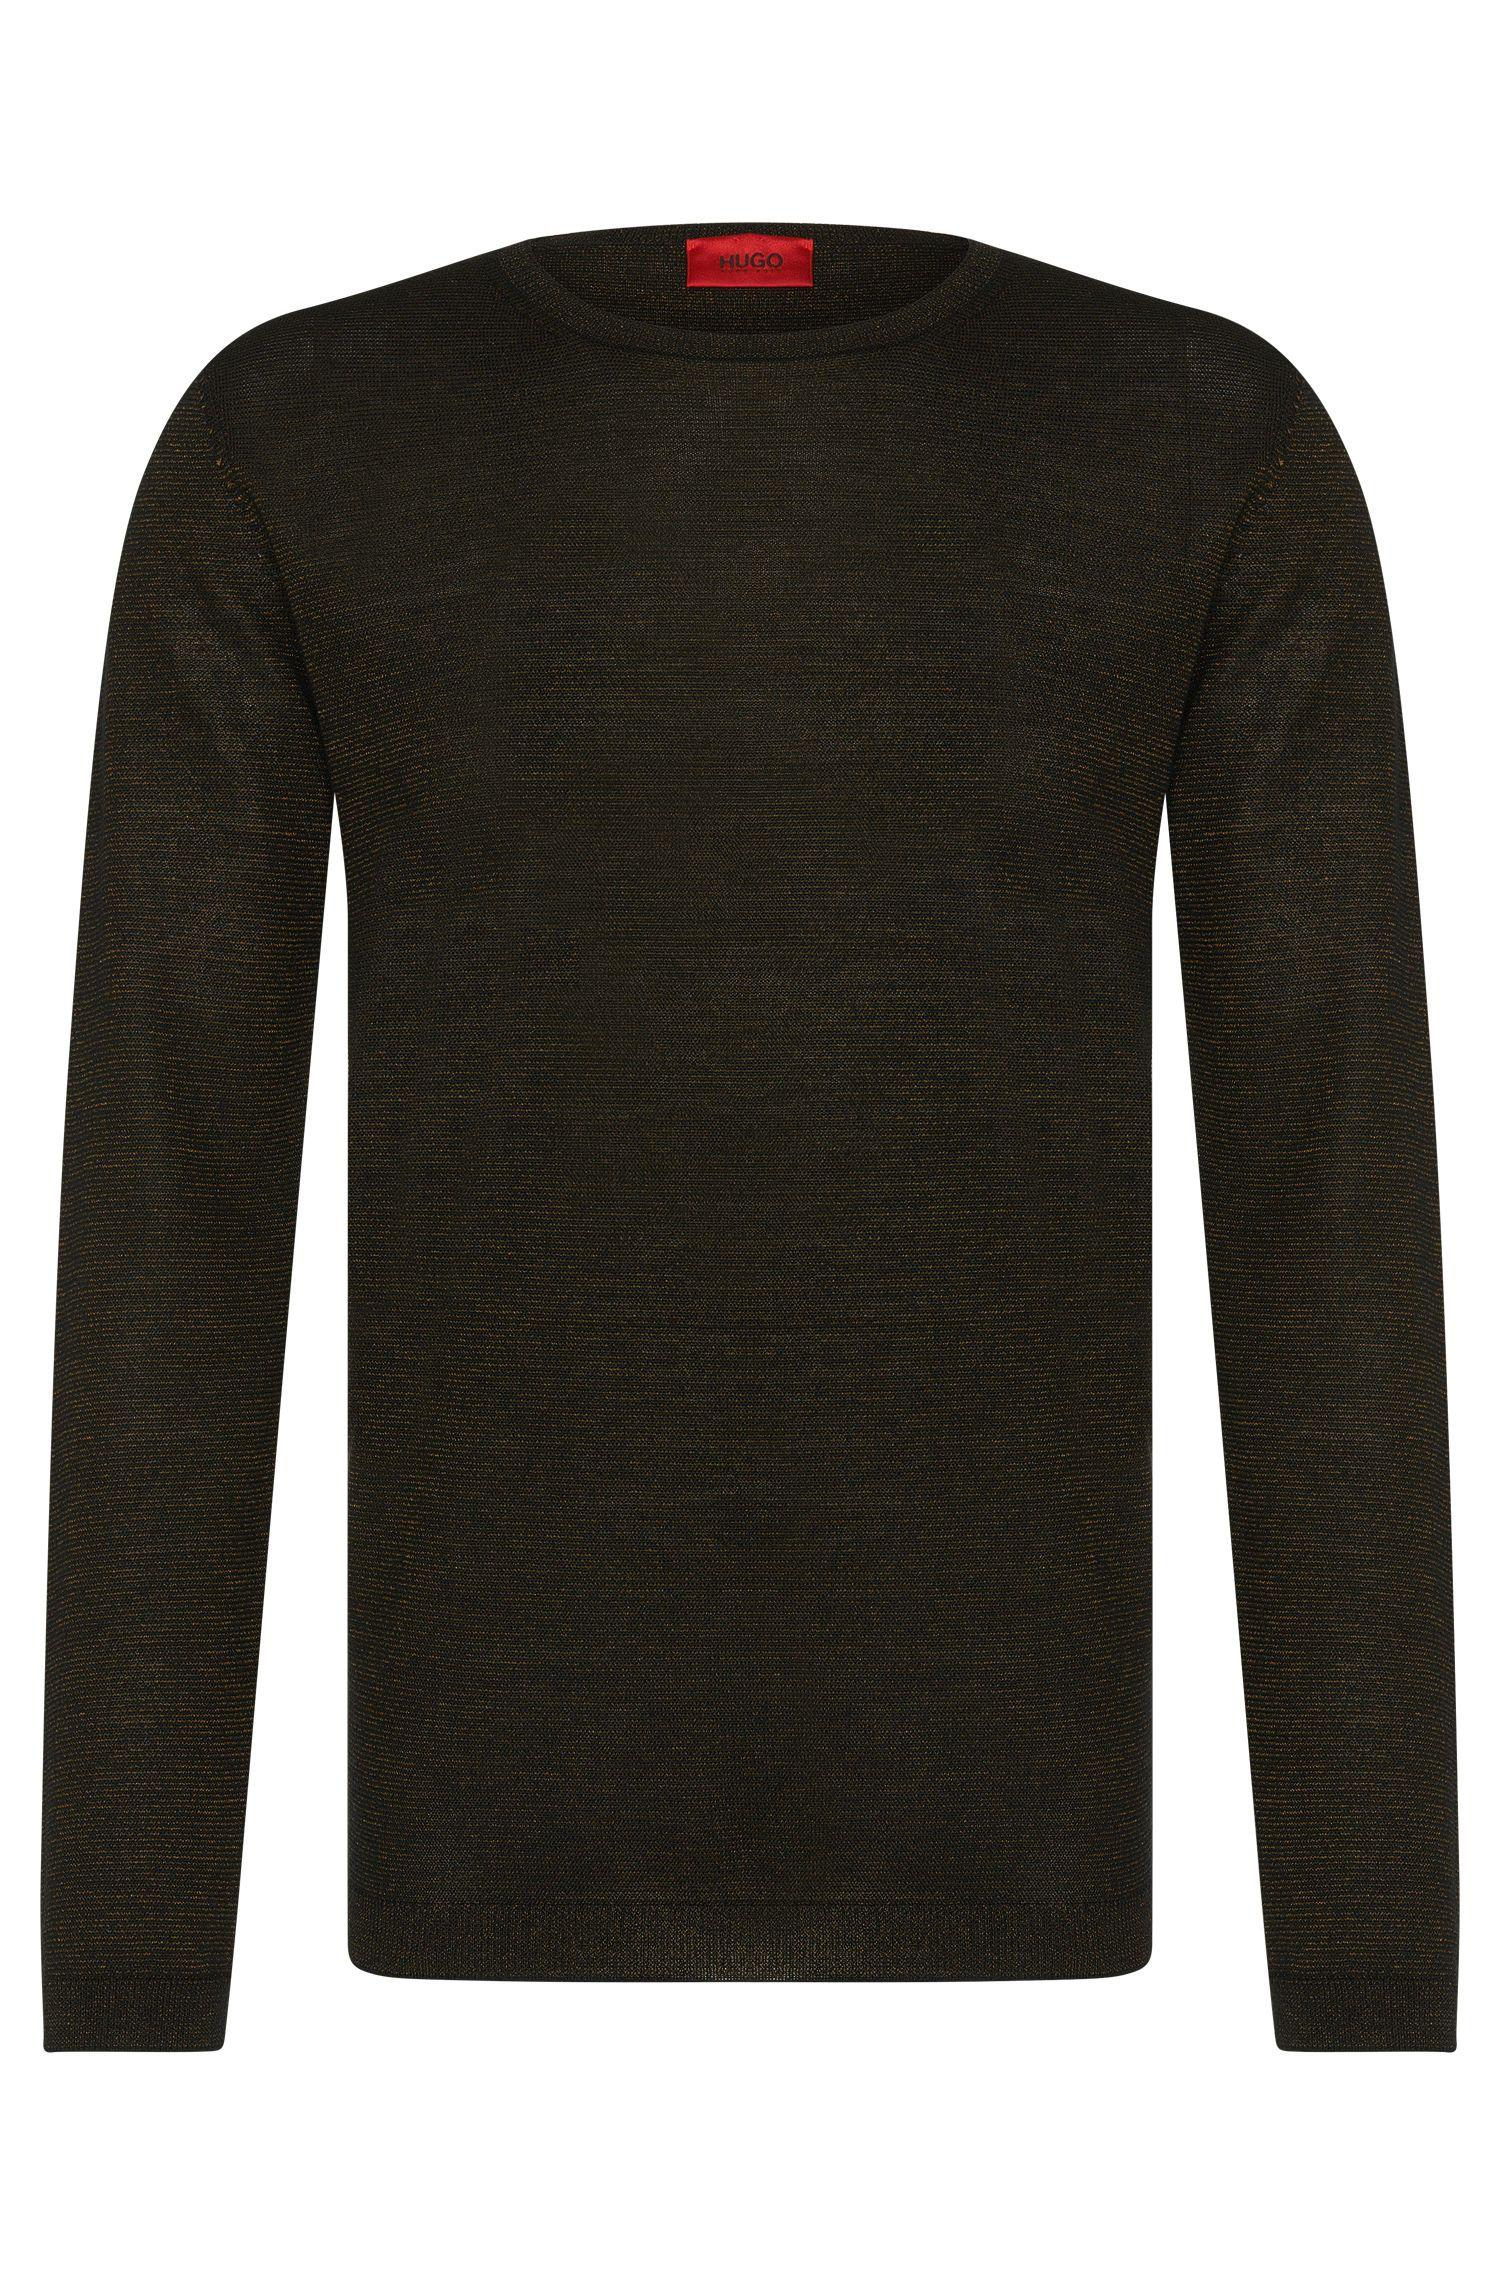 'Salex'   Merino Virgin Wool Blend Metallic Stripe Sweater